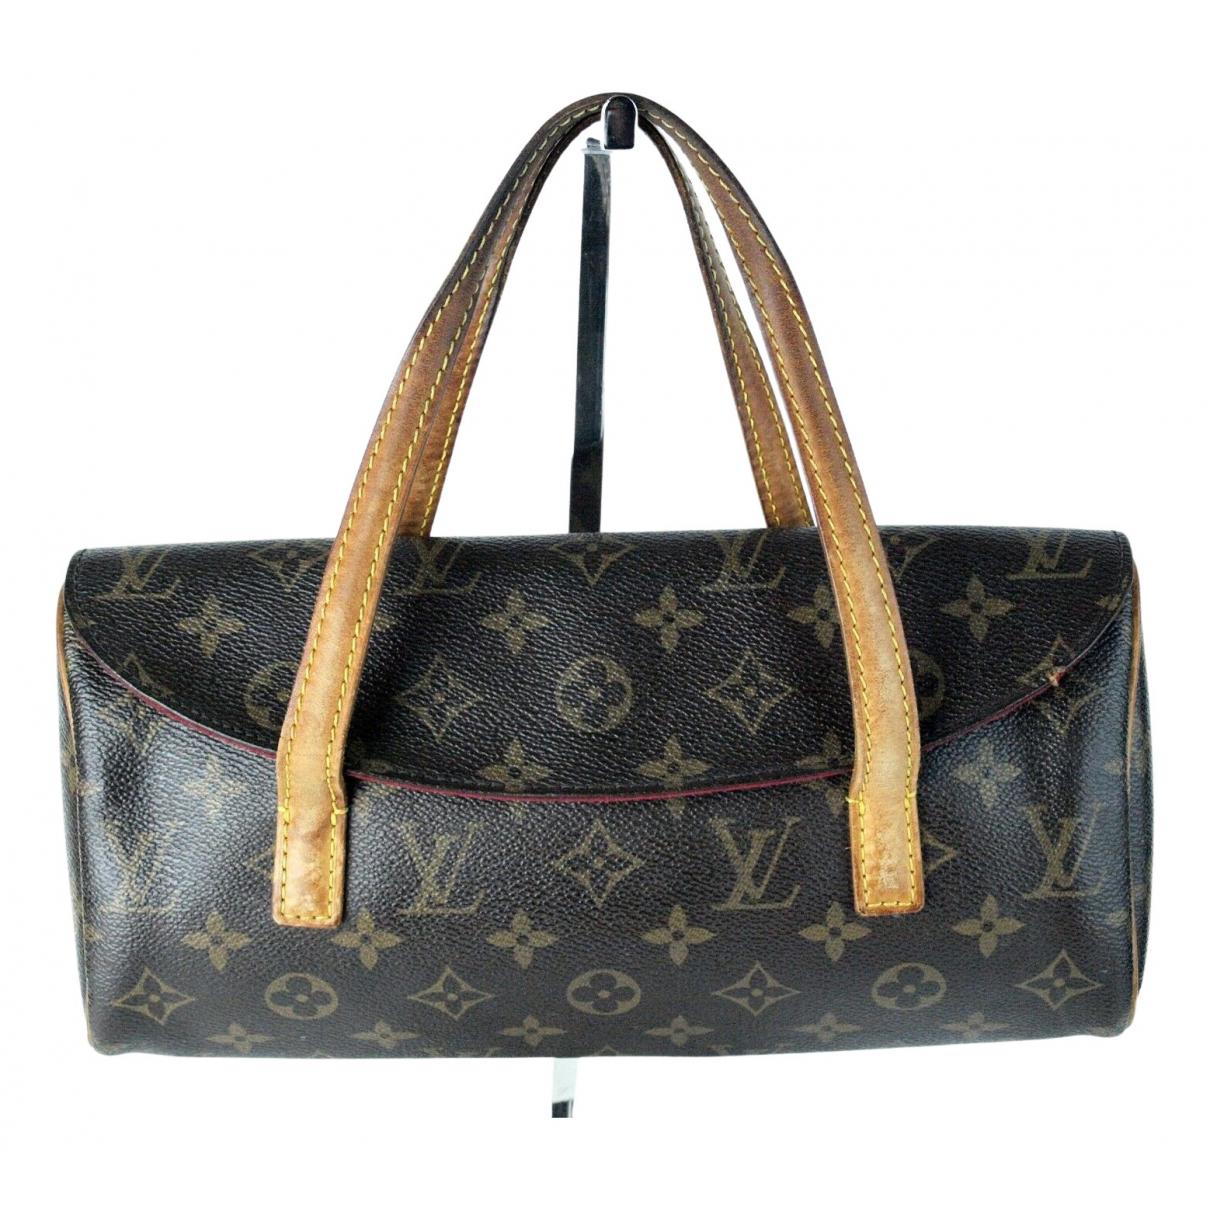 Bolso  Sonatine de Lona Louis Vuitton